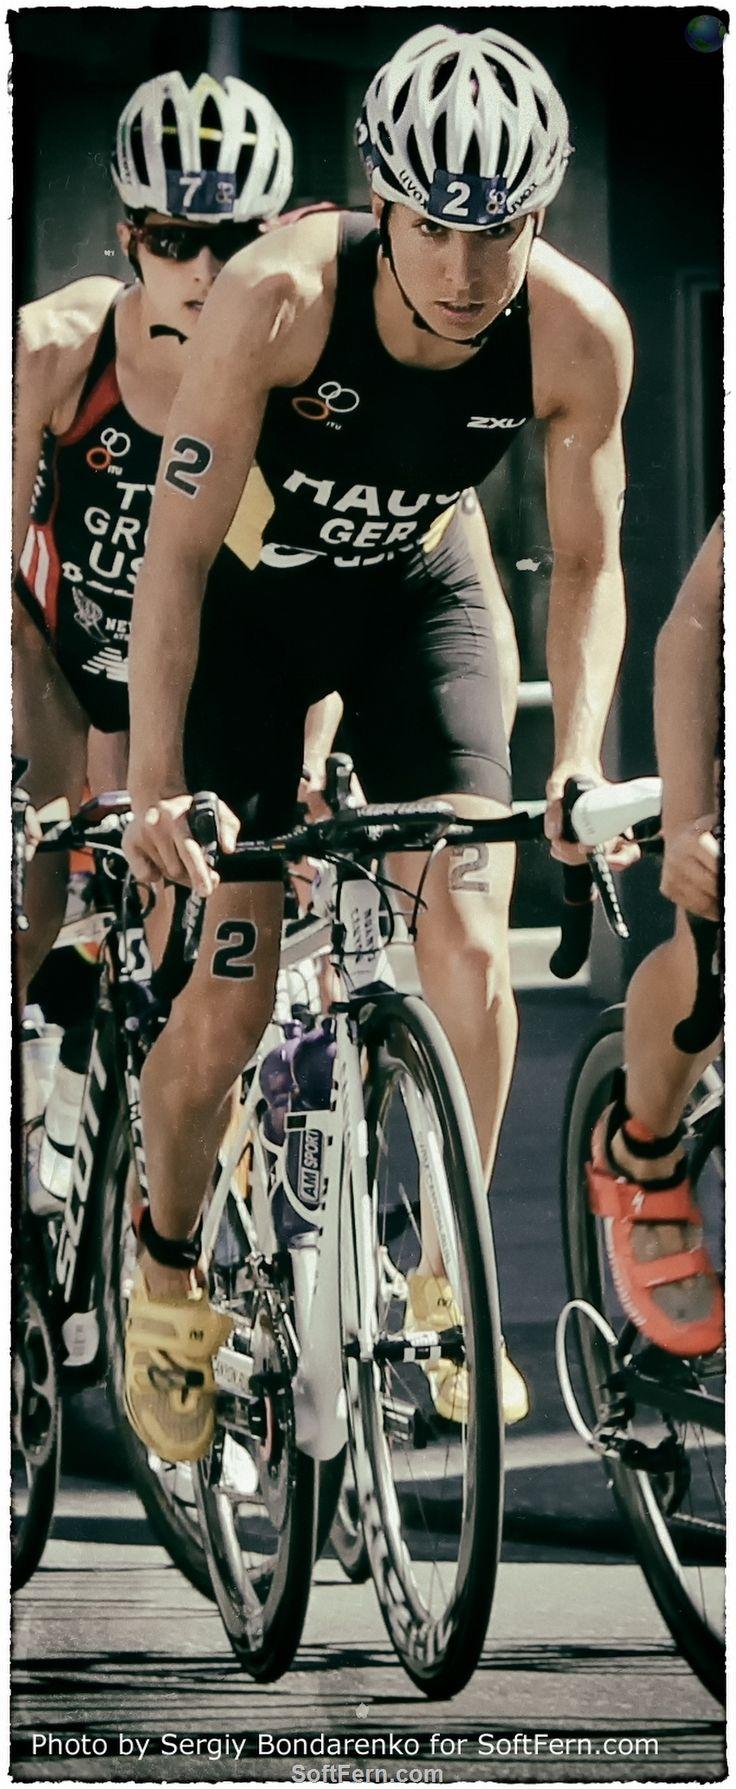 Auckland ITU World Series 2015. Women's elite. ... 32  PHOTOS ...Anne Haug (GER) – silver medallist of Auckland ITU World Triathlon 2014  http://softfern.com/NewsDtls.aspx?id=998&catgry=7 #Auckland ITU #World #Triathlon 2015,  photos of #Auckland #Triathlon